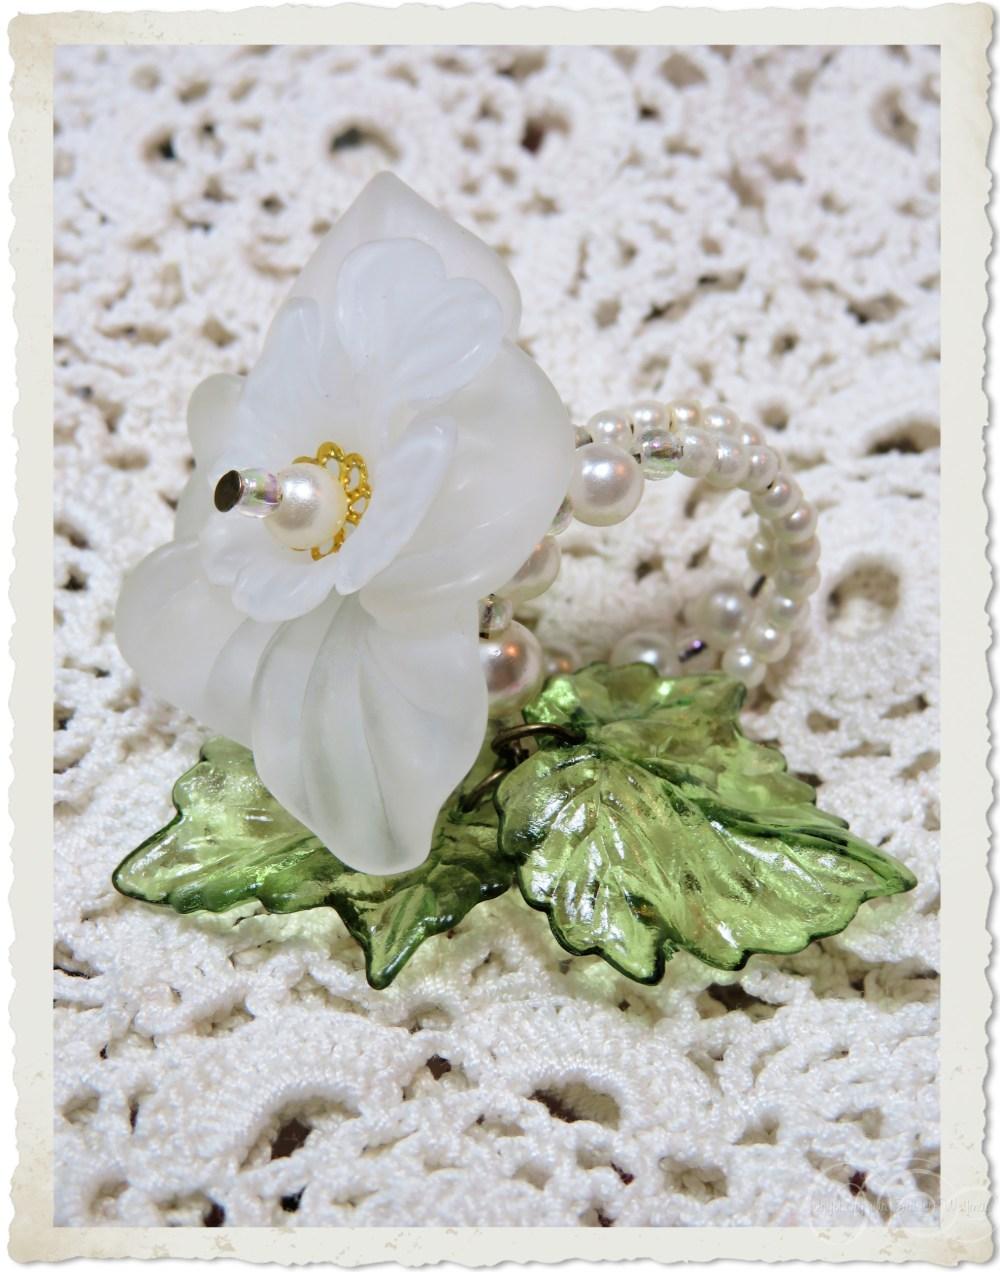 Handmade white green flower ring with artificial pearls by Ingeborg van Zuiden